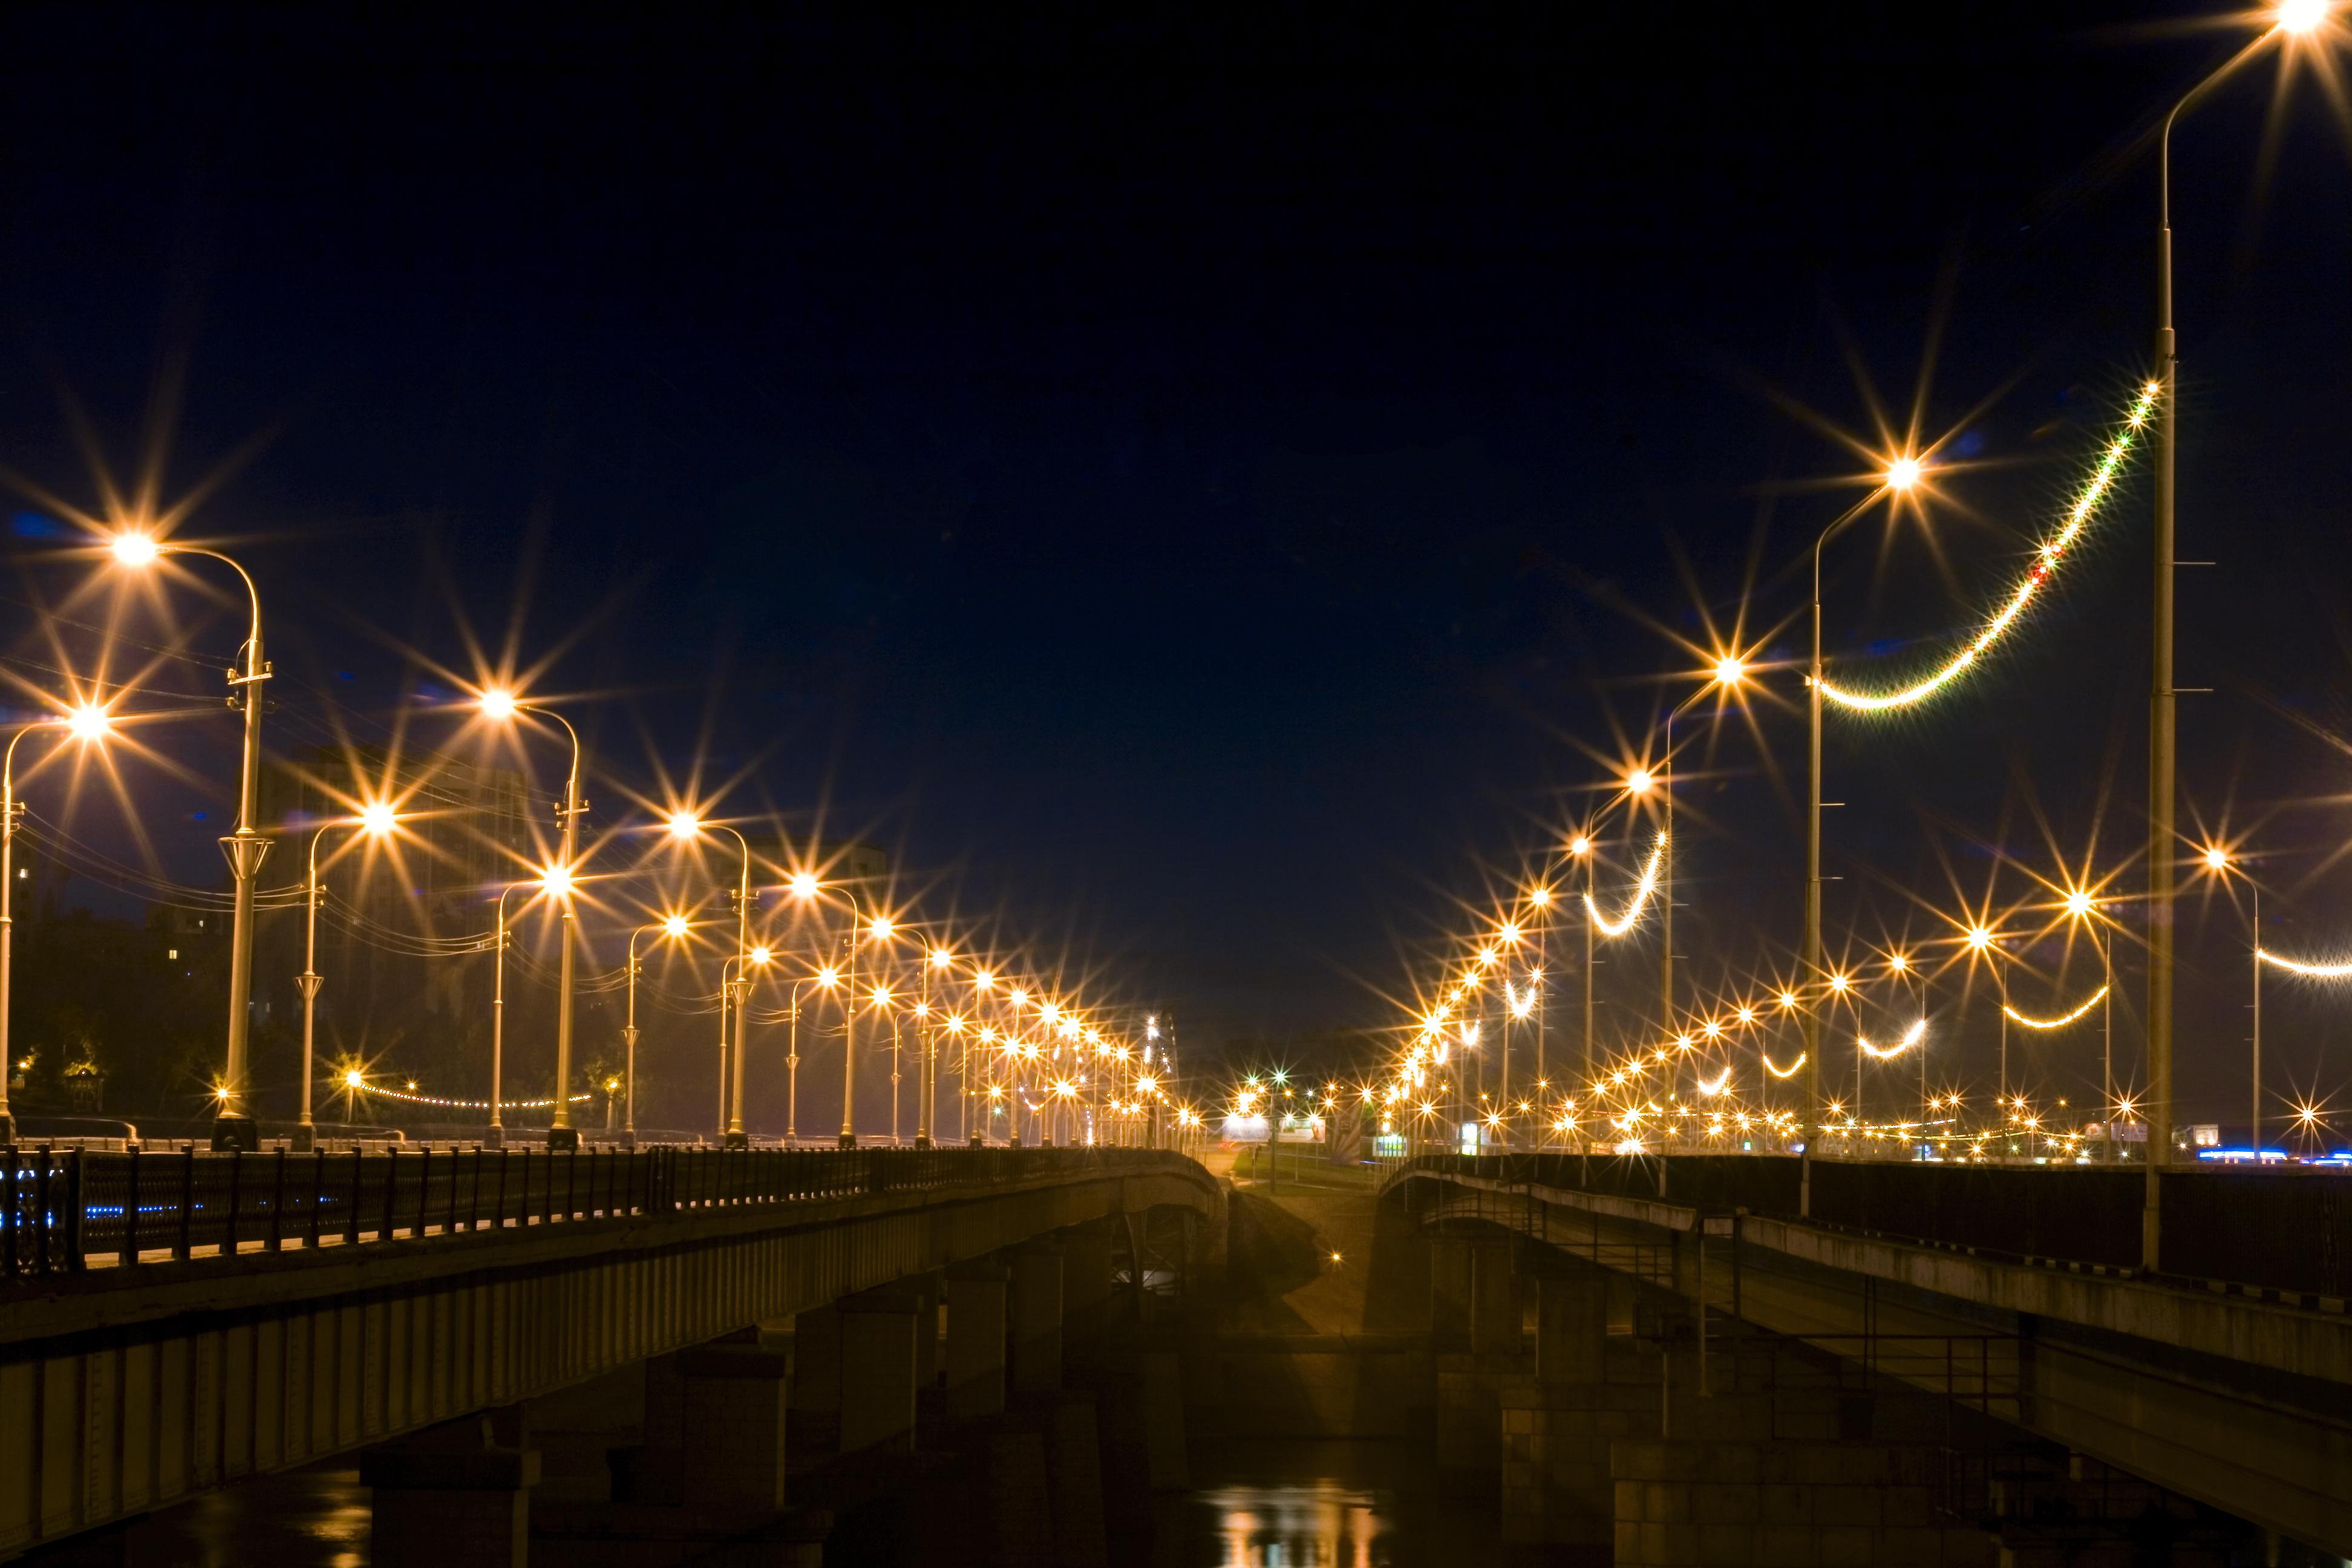 Night scene, Urban, Russia, Under, Twilight, HQ Photo